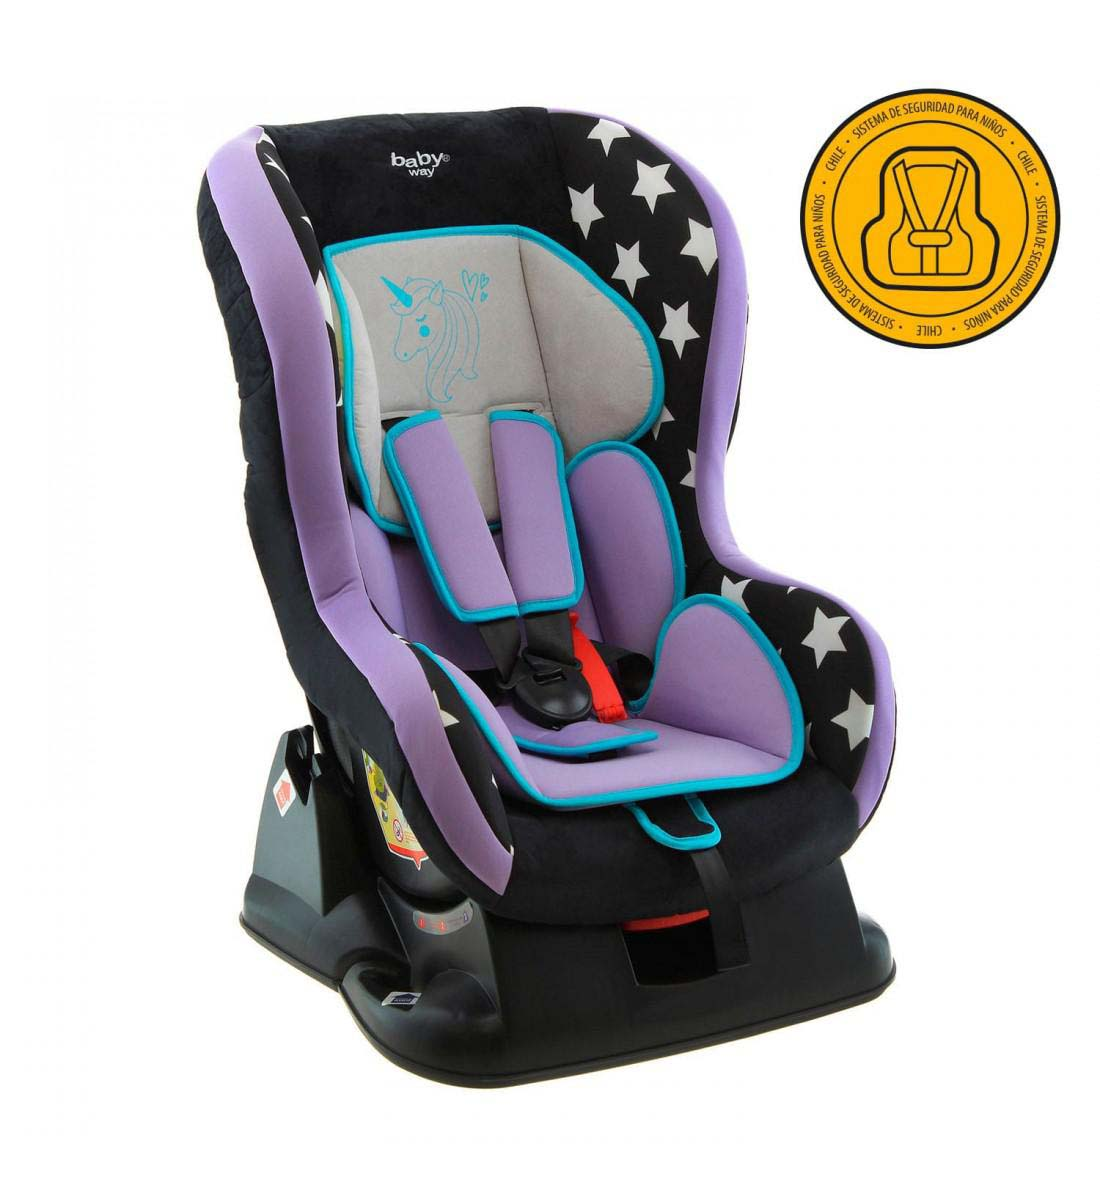 Butaca De Auto Baby Way Unicornio Bw-743M19